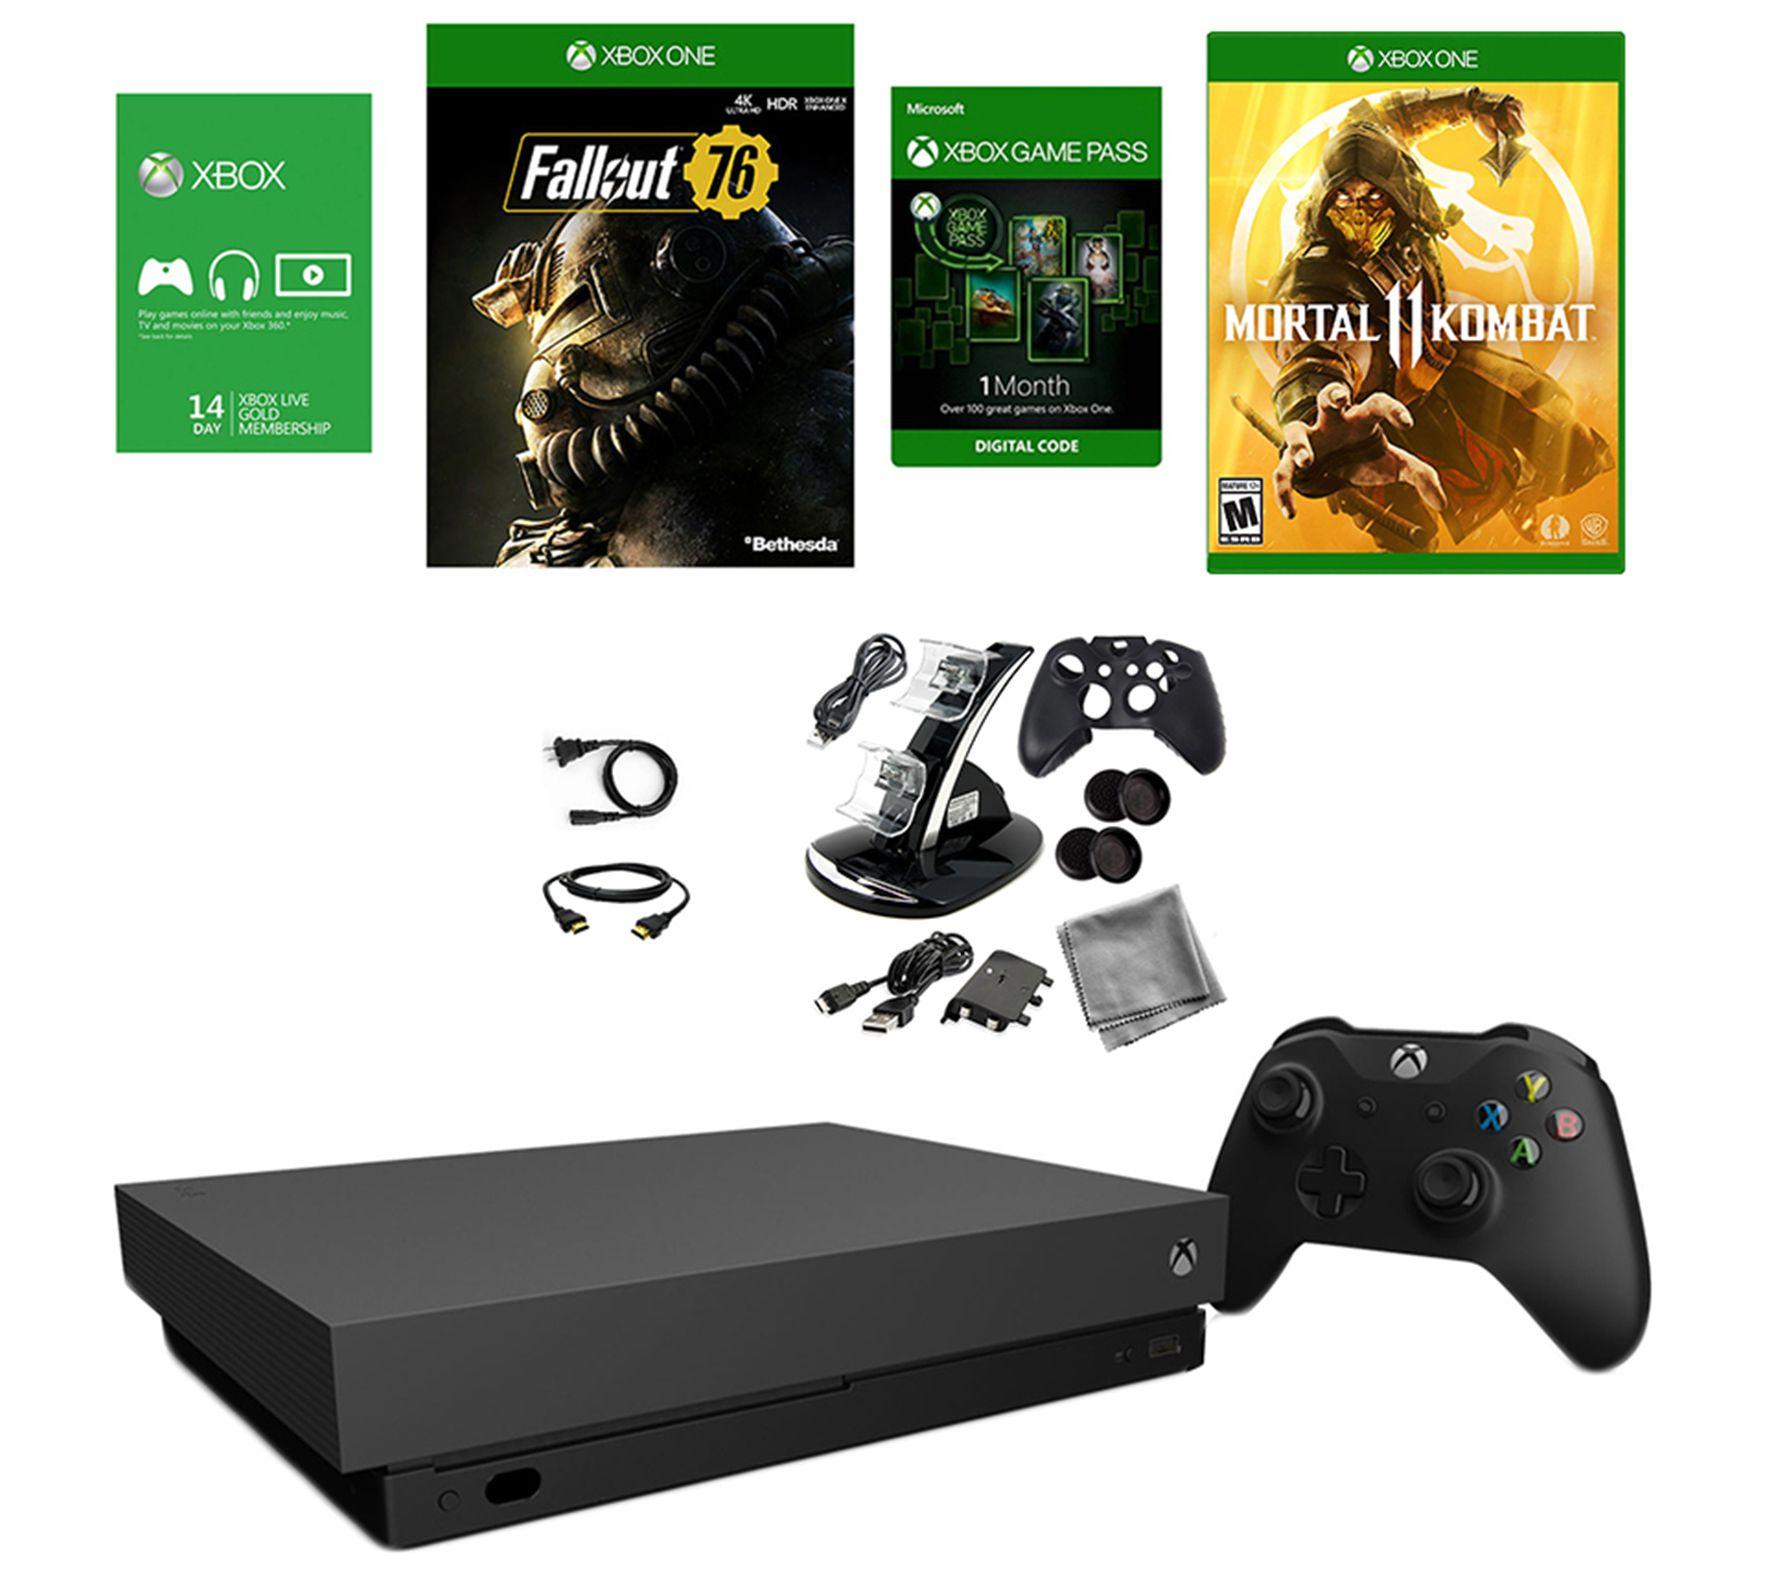 Xbox One X Console Mortal Kombat 11, Fallout 76, Accessories — QVC com